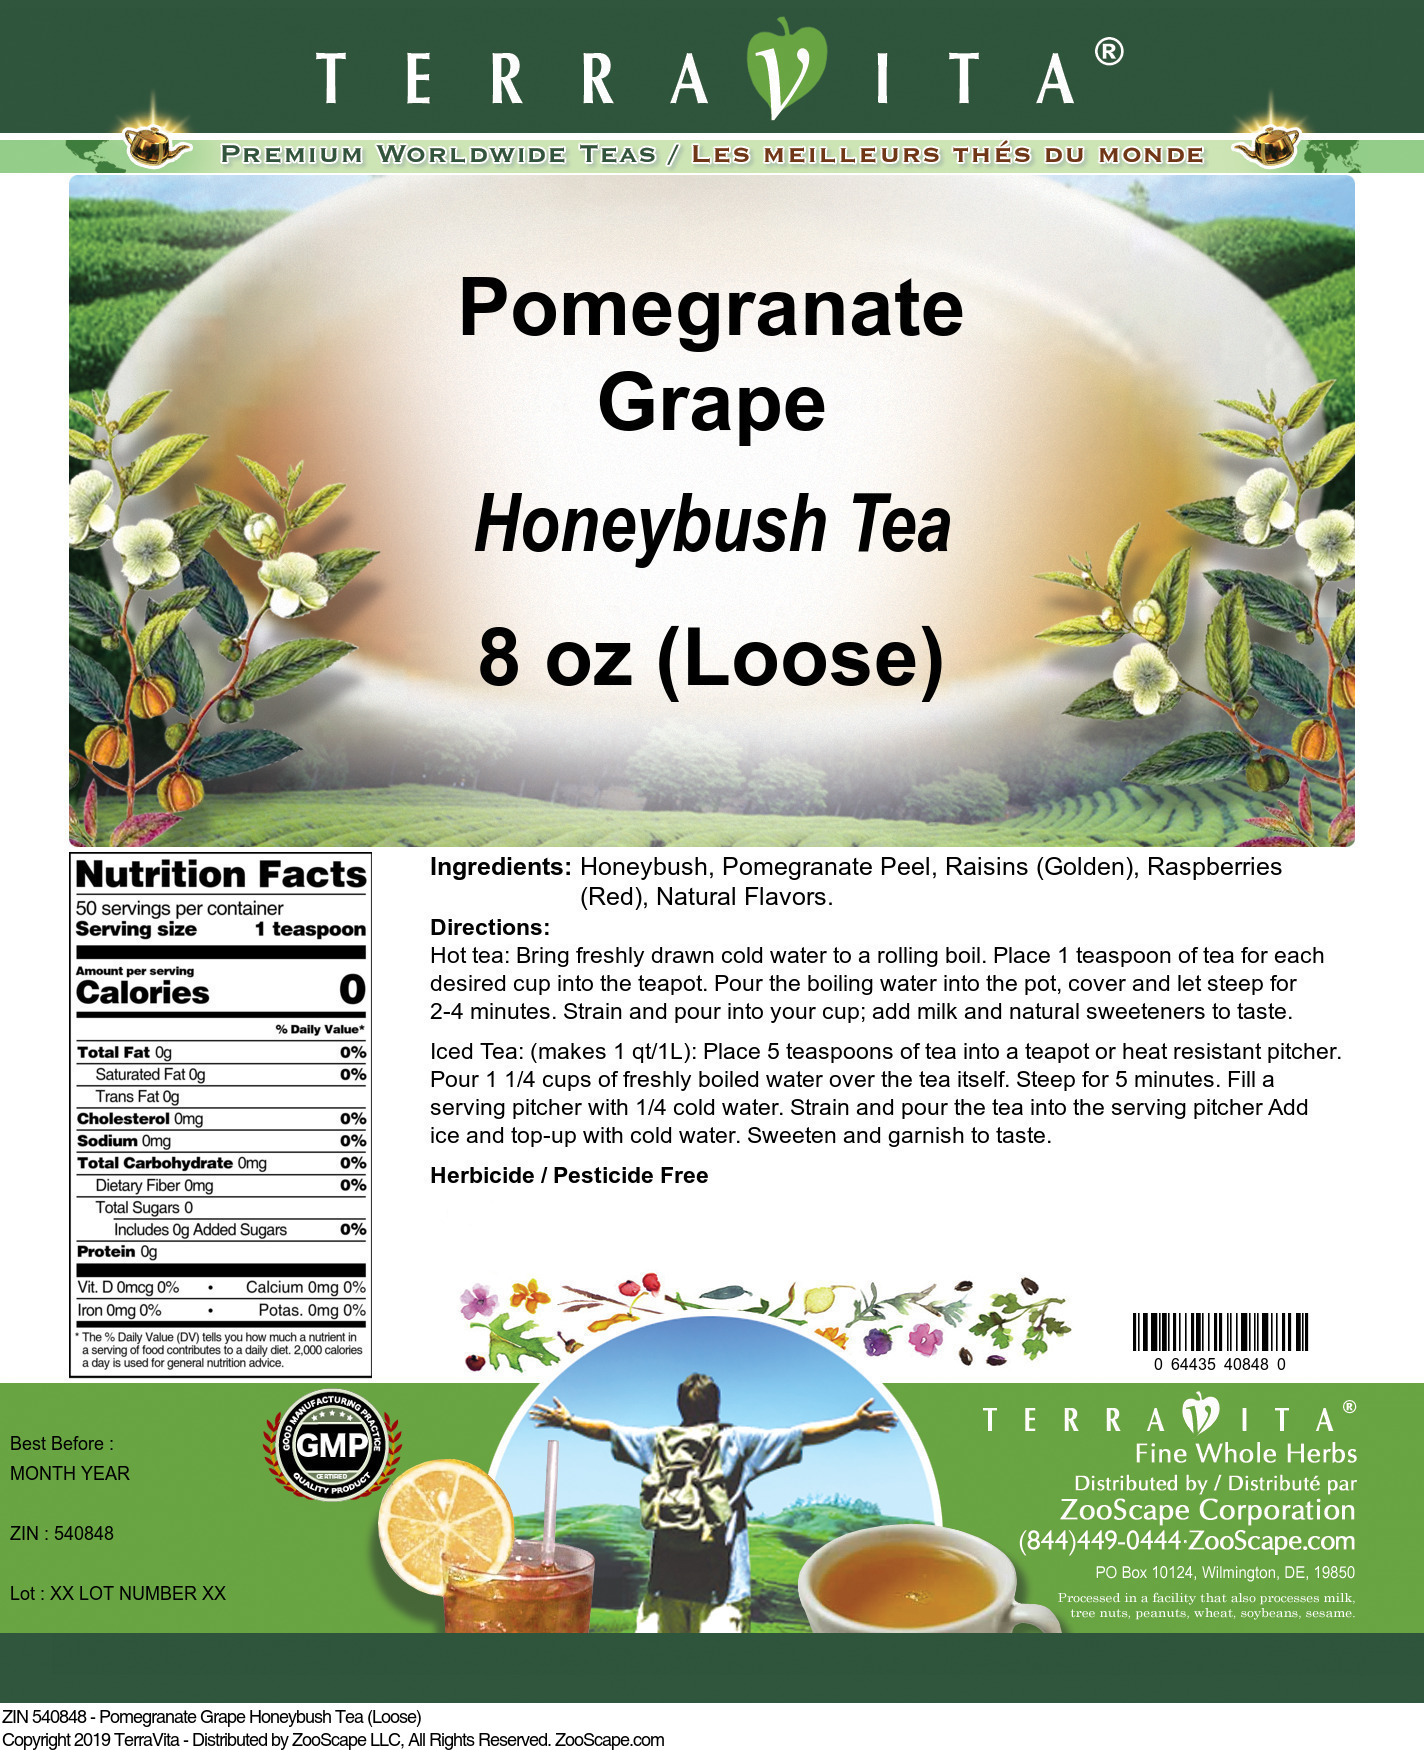 Pomegranate Grape Honeybush Tea (Loose)